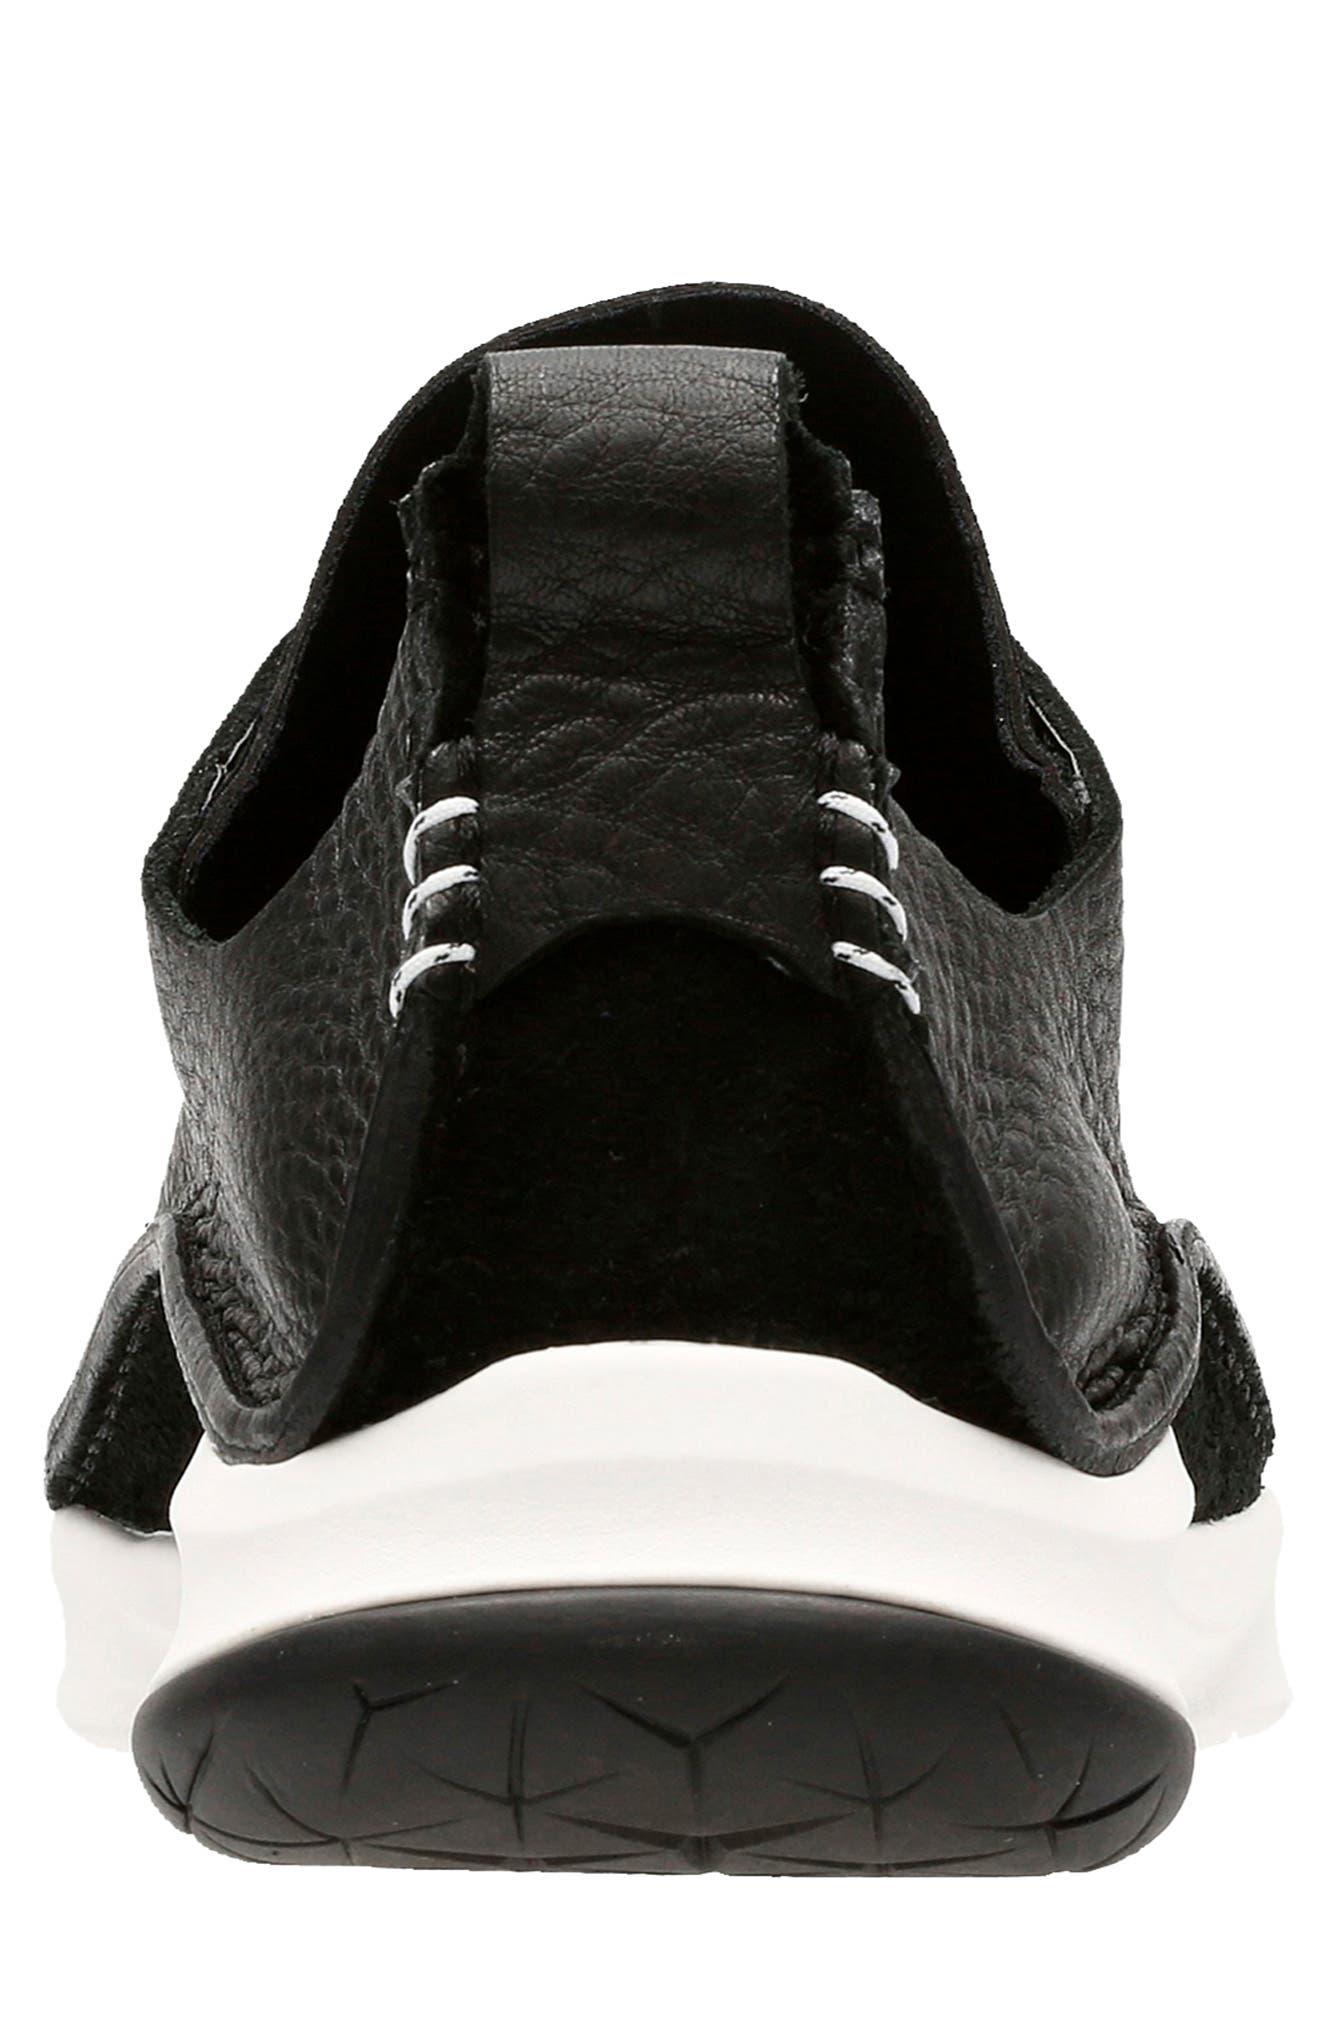 Privolution Lo Sneaker,                             Alternate thumbnail 6, color,                             BLACKOUT